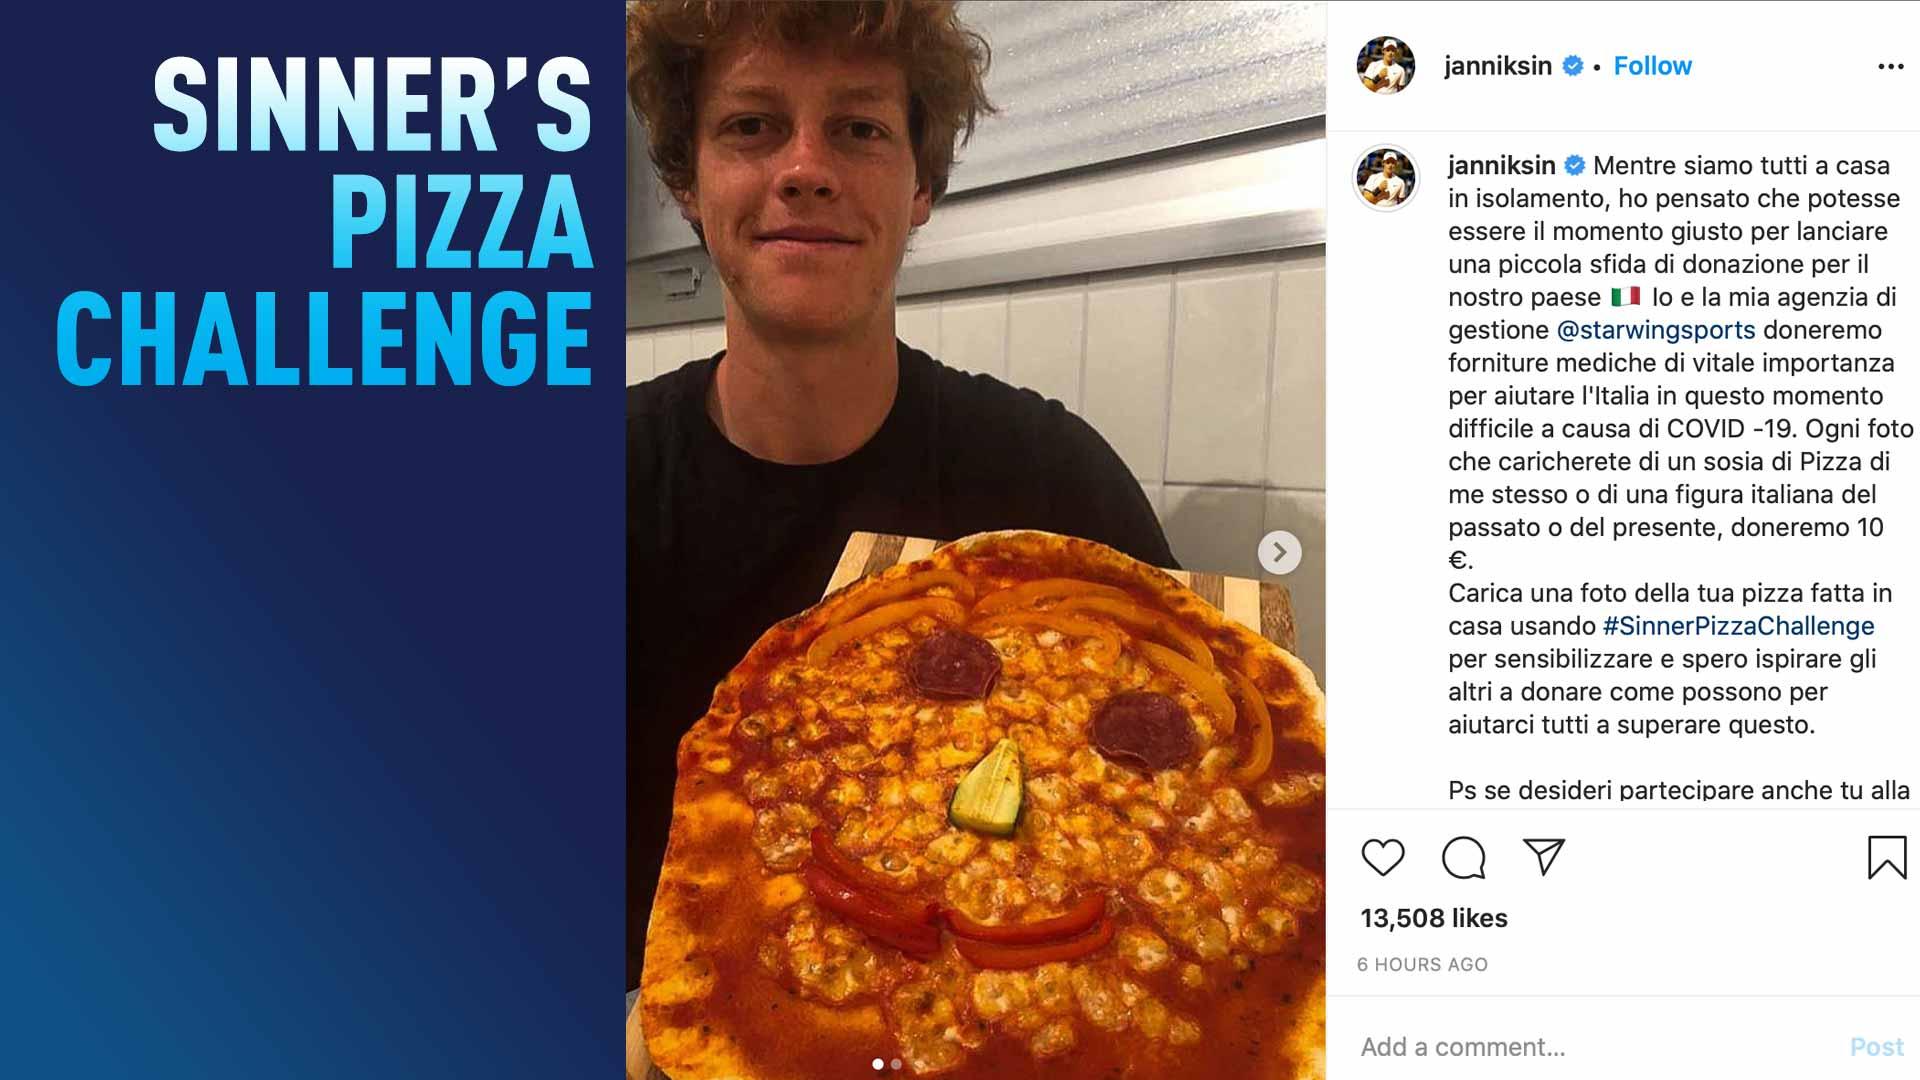 Alongside his management company Starwing Sports, Jannik Sinner pledges to donate €10 for every #SinnerPizzaChallenge post on Instagram.